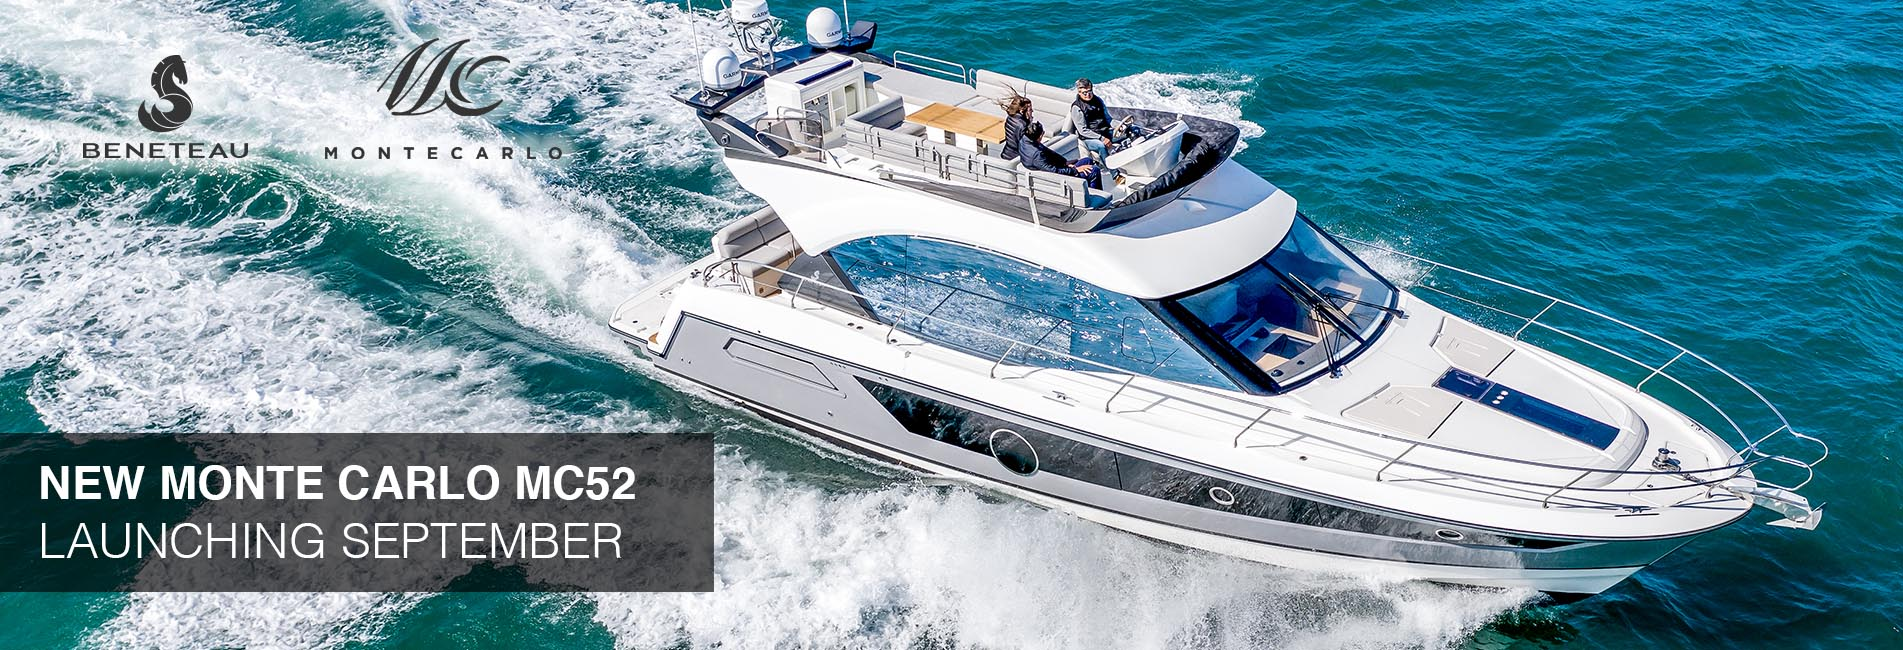 New Beneteau Monte Carlo 52 2019 Cannes Southampton